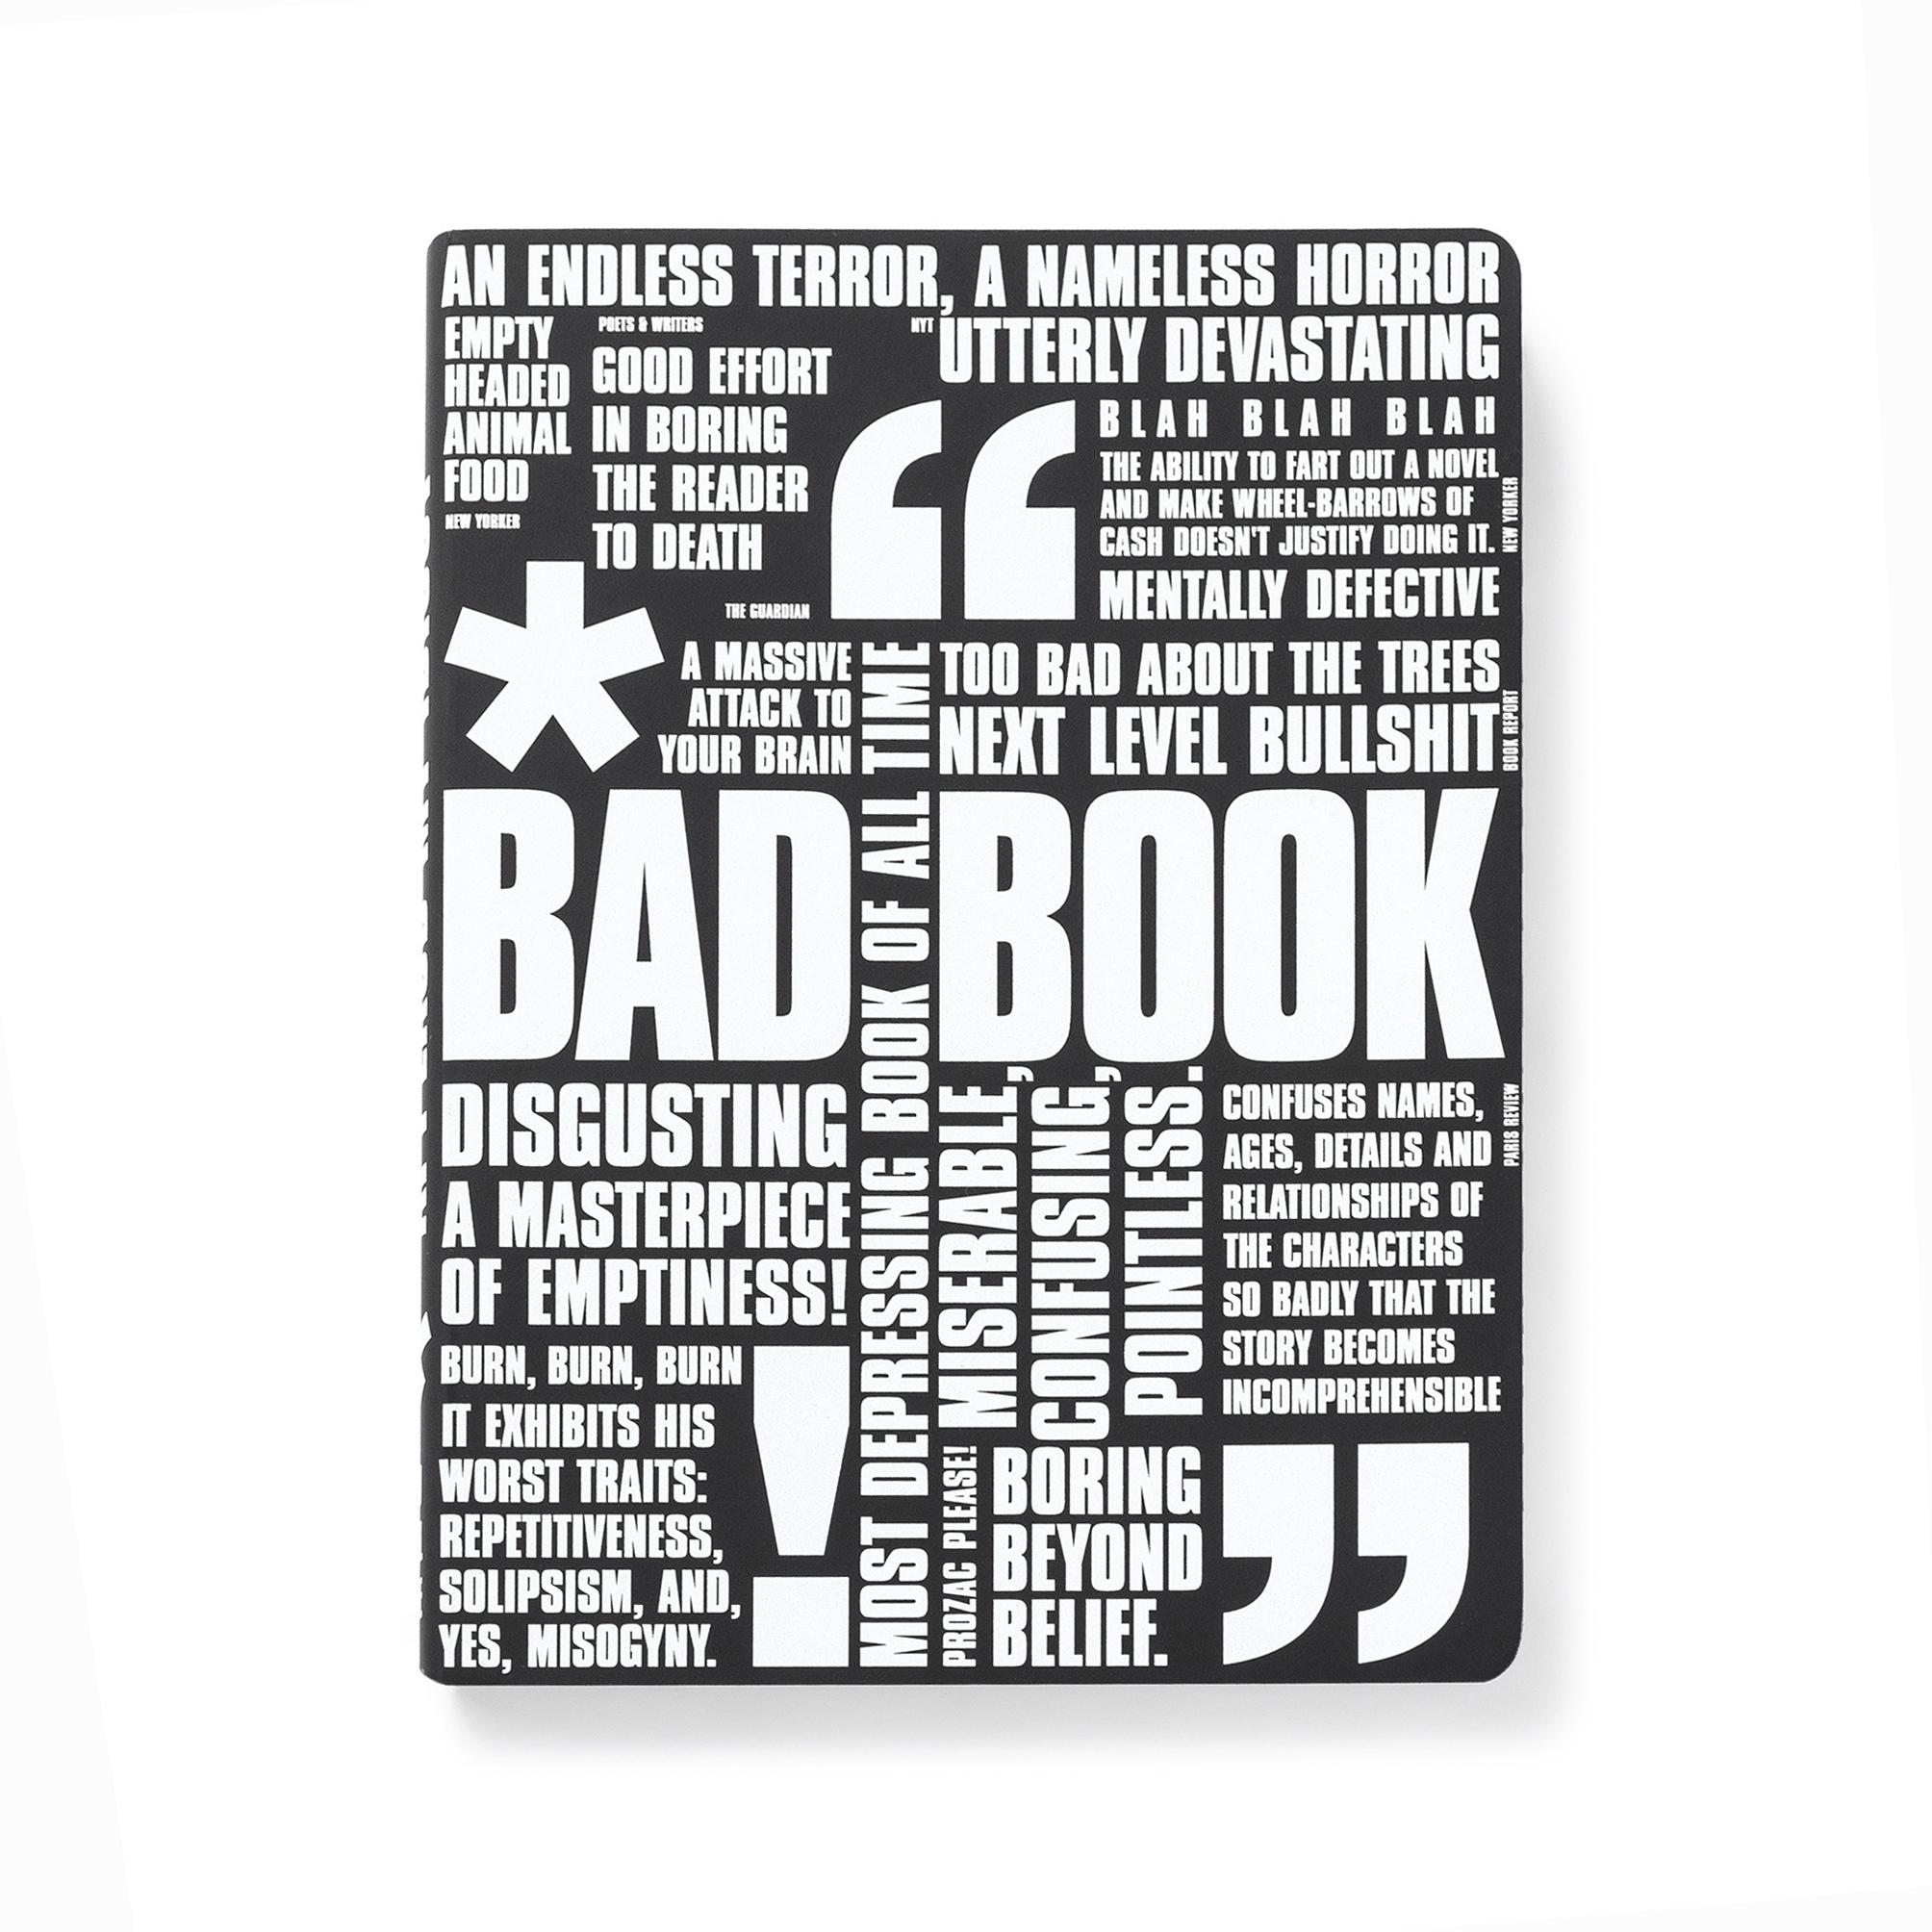 CUADERNO BAD BOOK